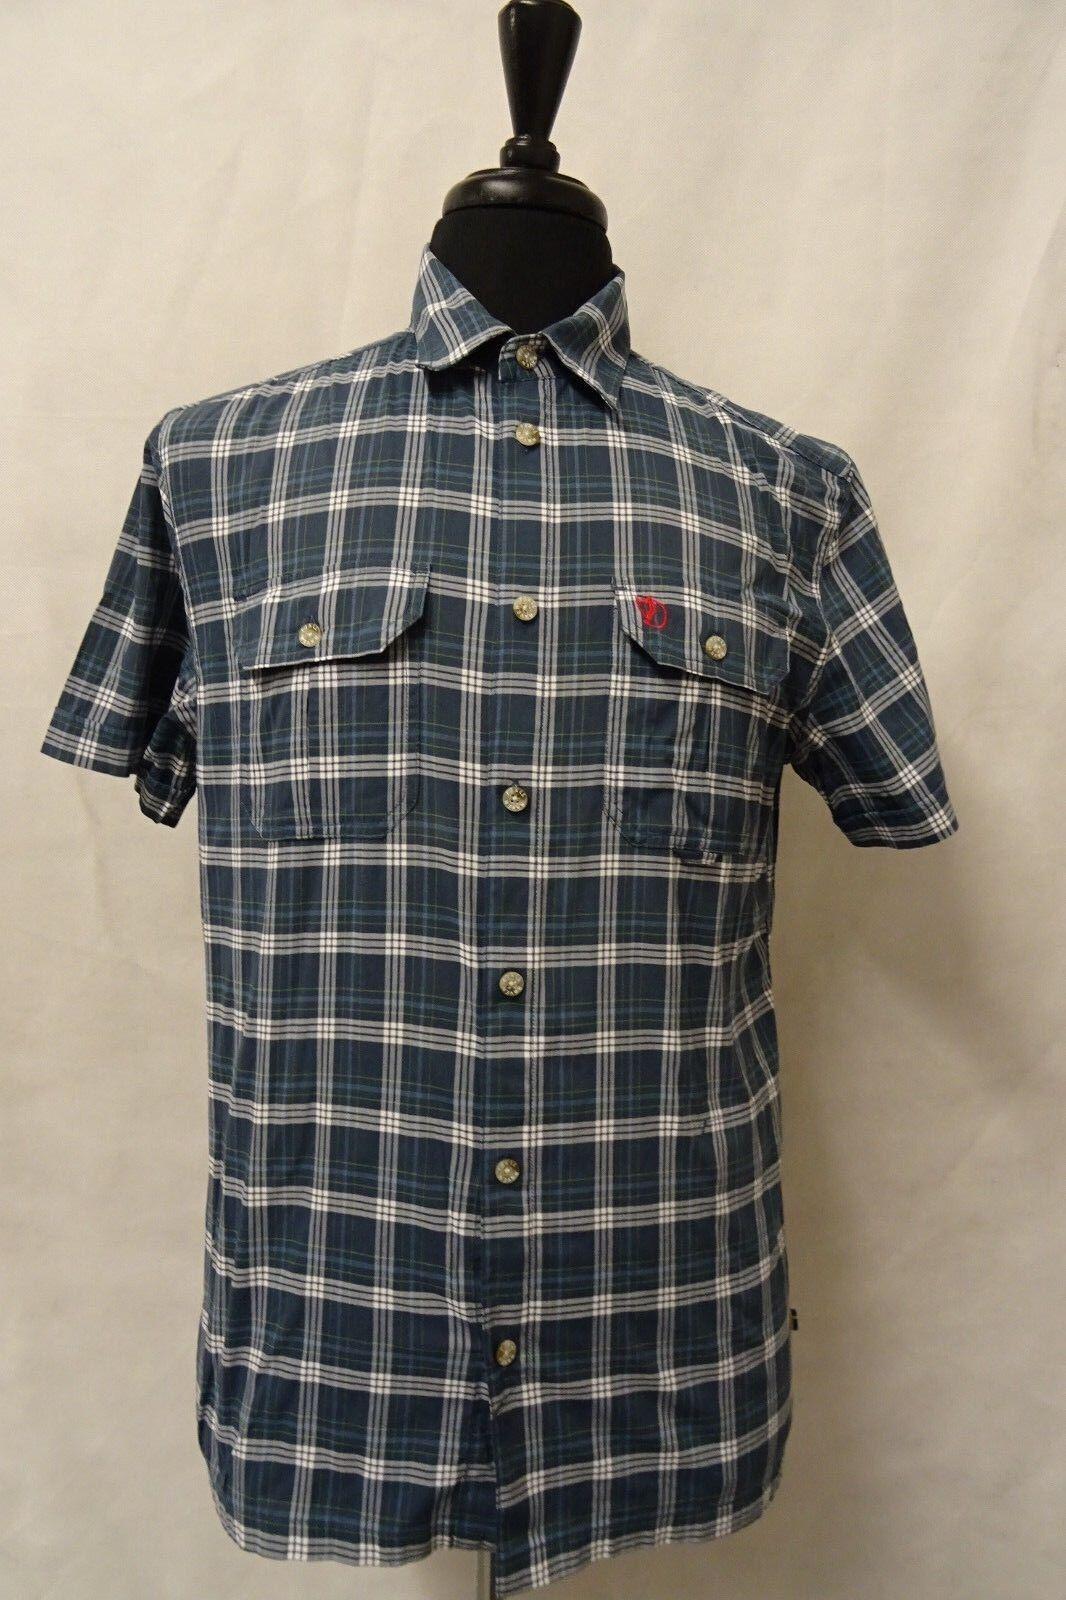 9b391e9ad14a7c Men s Fjallraven Walking Size M AA2805 Shirt Trekking neequu2118-Casual  Shirts   Tops